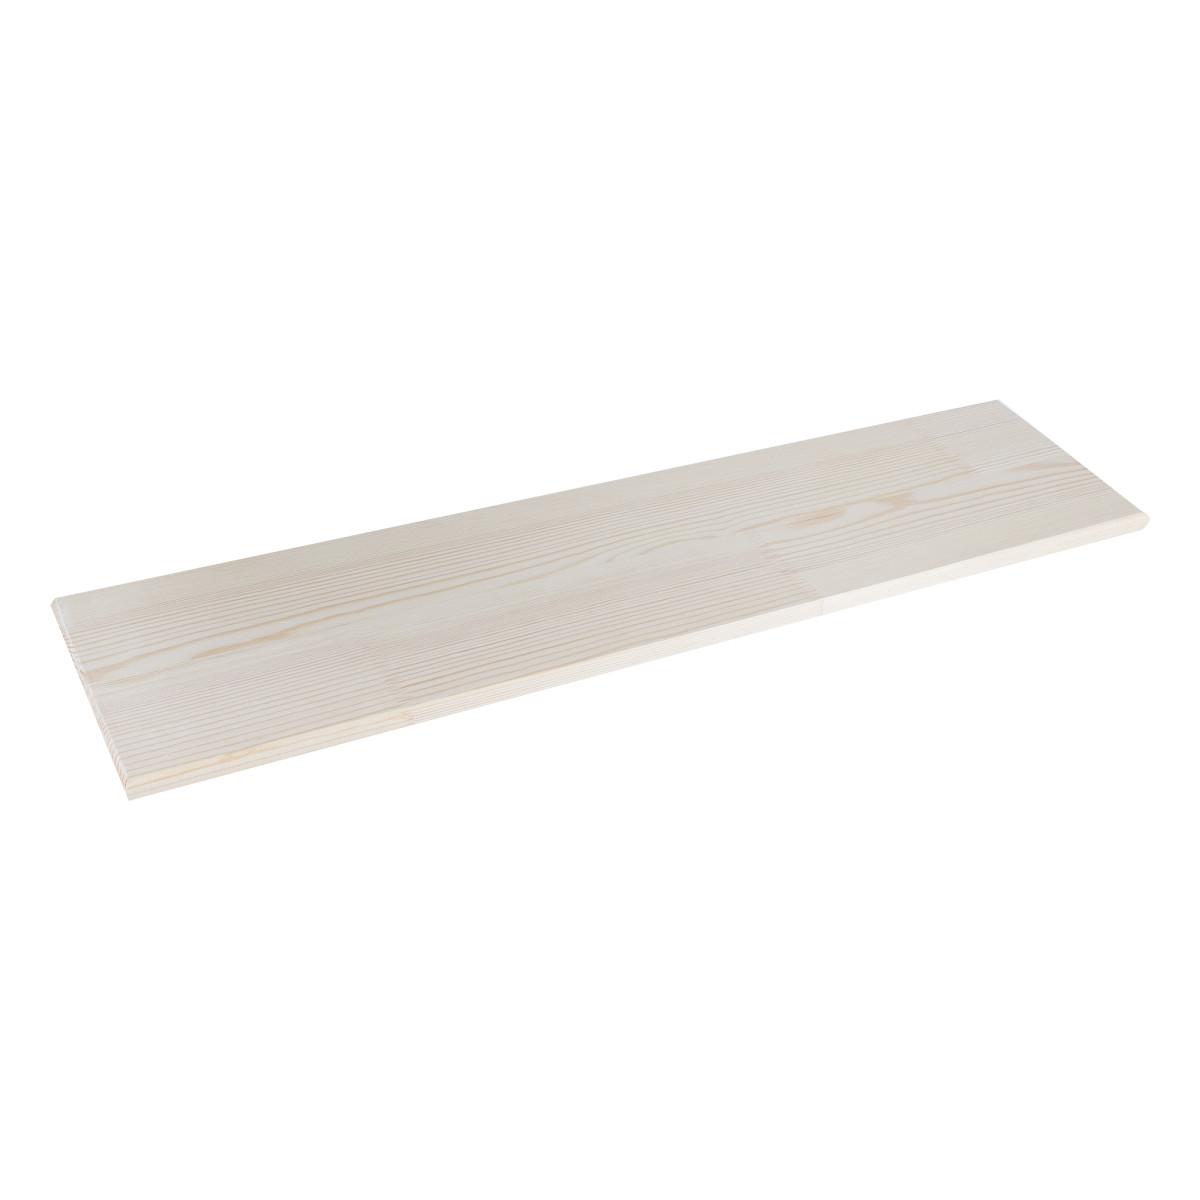 Полка мебельная Miolla 800х200х108 мм сосна